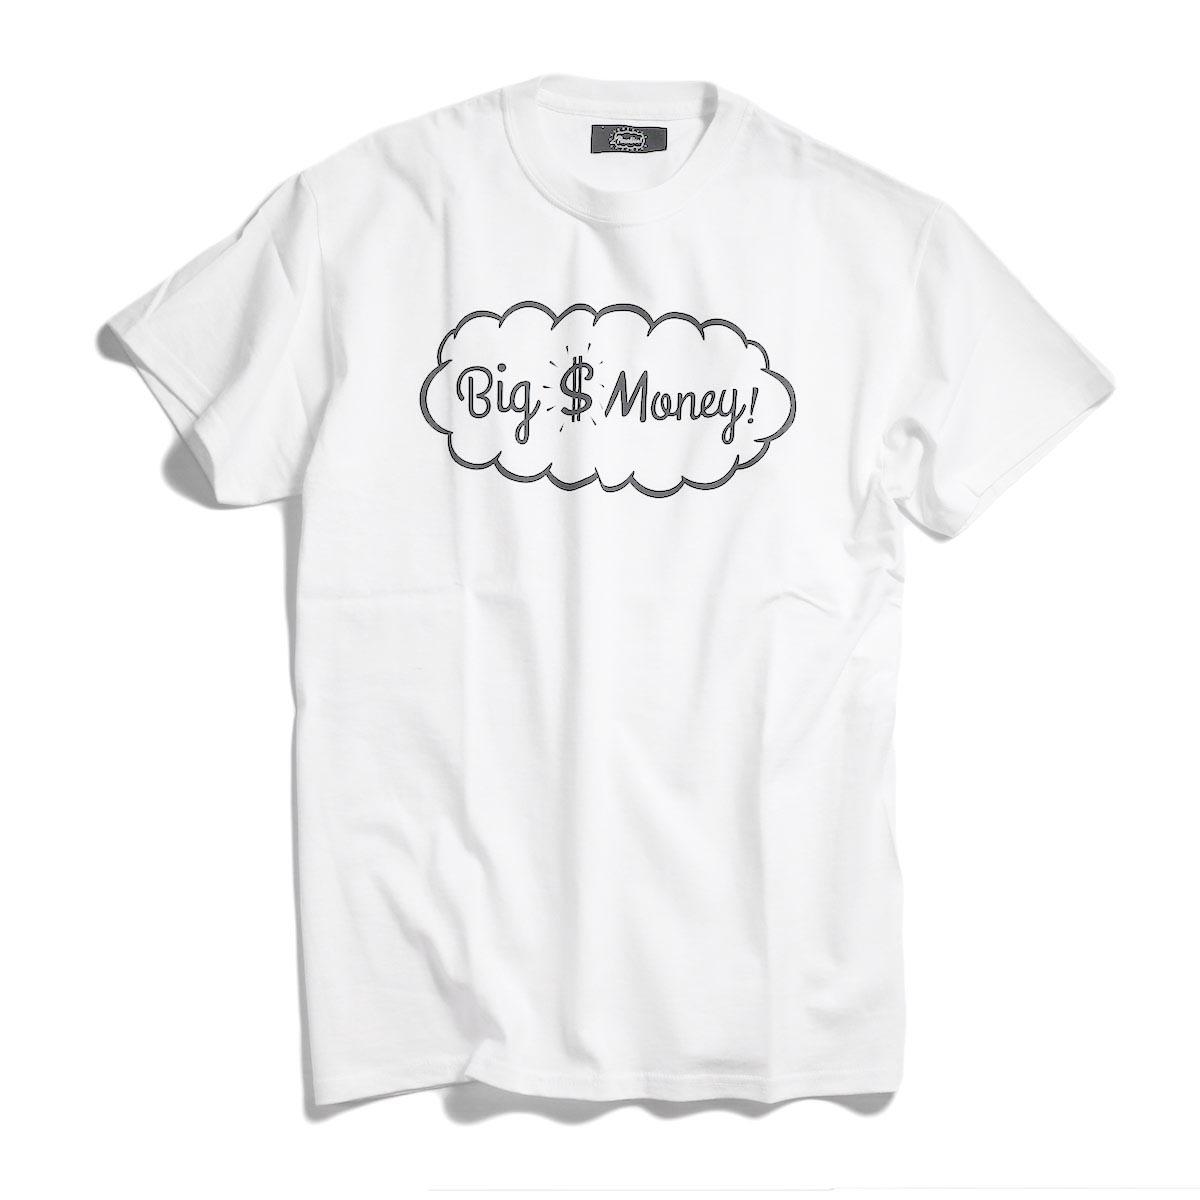 Paradise! / T-Shirt (C'mon) -WhiteParadise! / T-Shirt (Big Money) -White